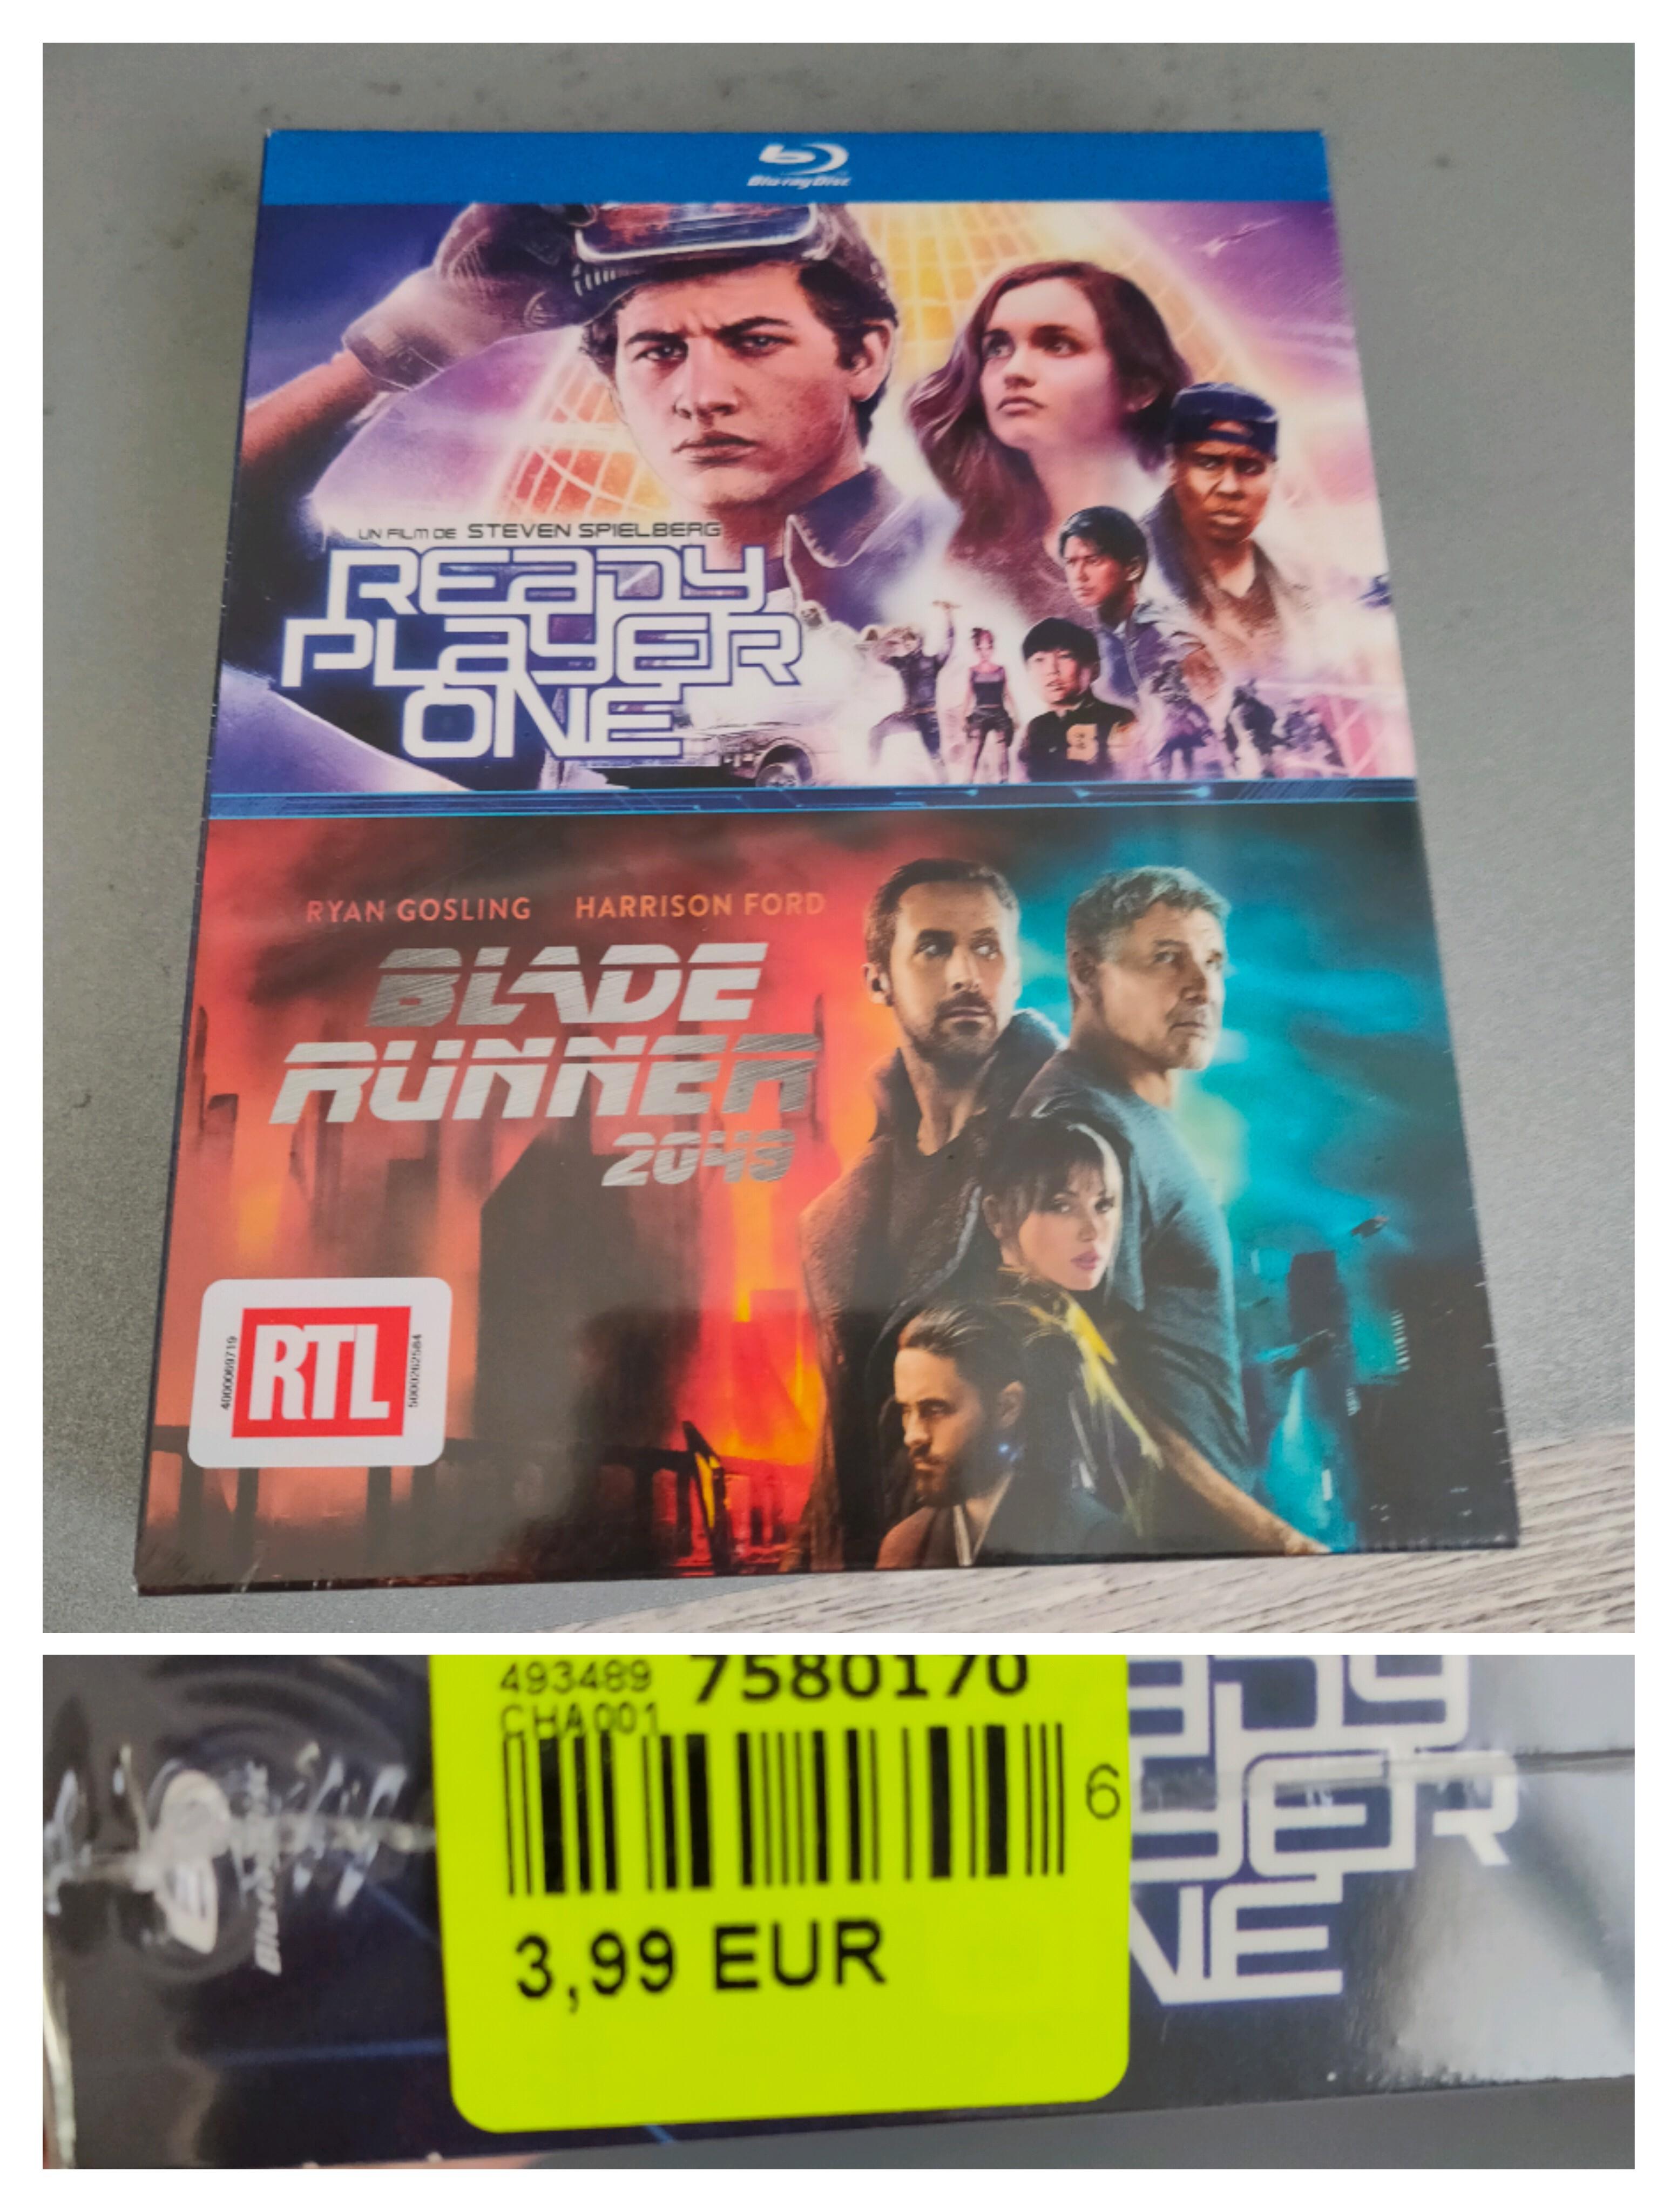 Coffret Blu-ray 2 films - Ready Player One & Blade Runner 2049 (Lons 64)